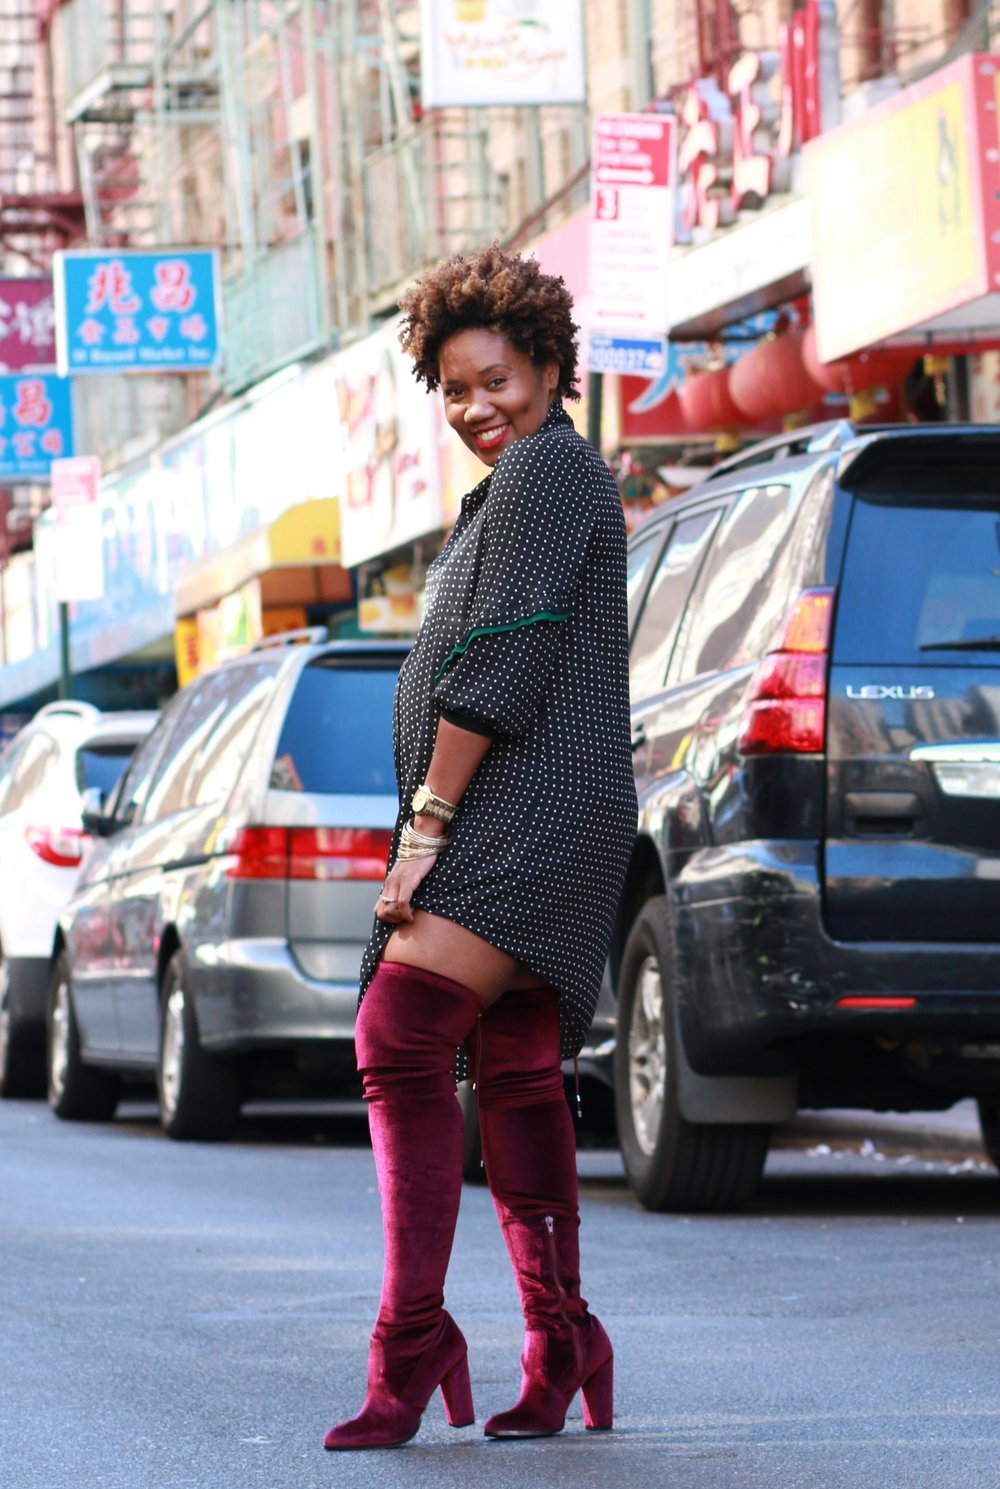 Velvet-thigh-high-boots-pregnancy-style.JPG